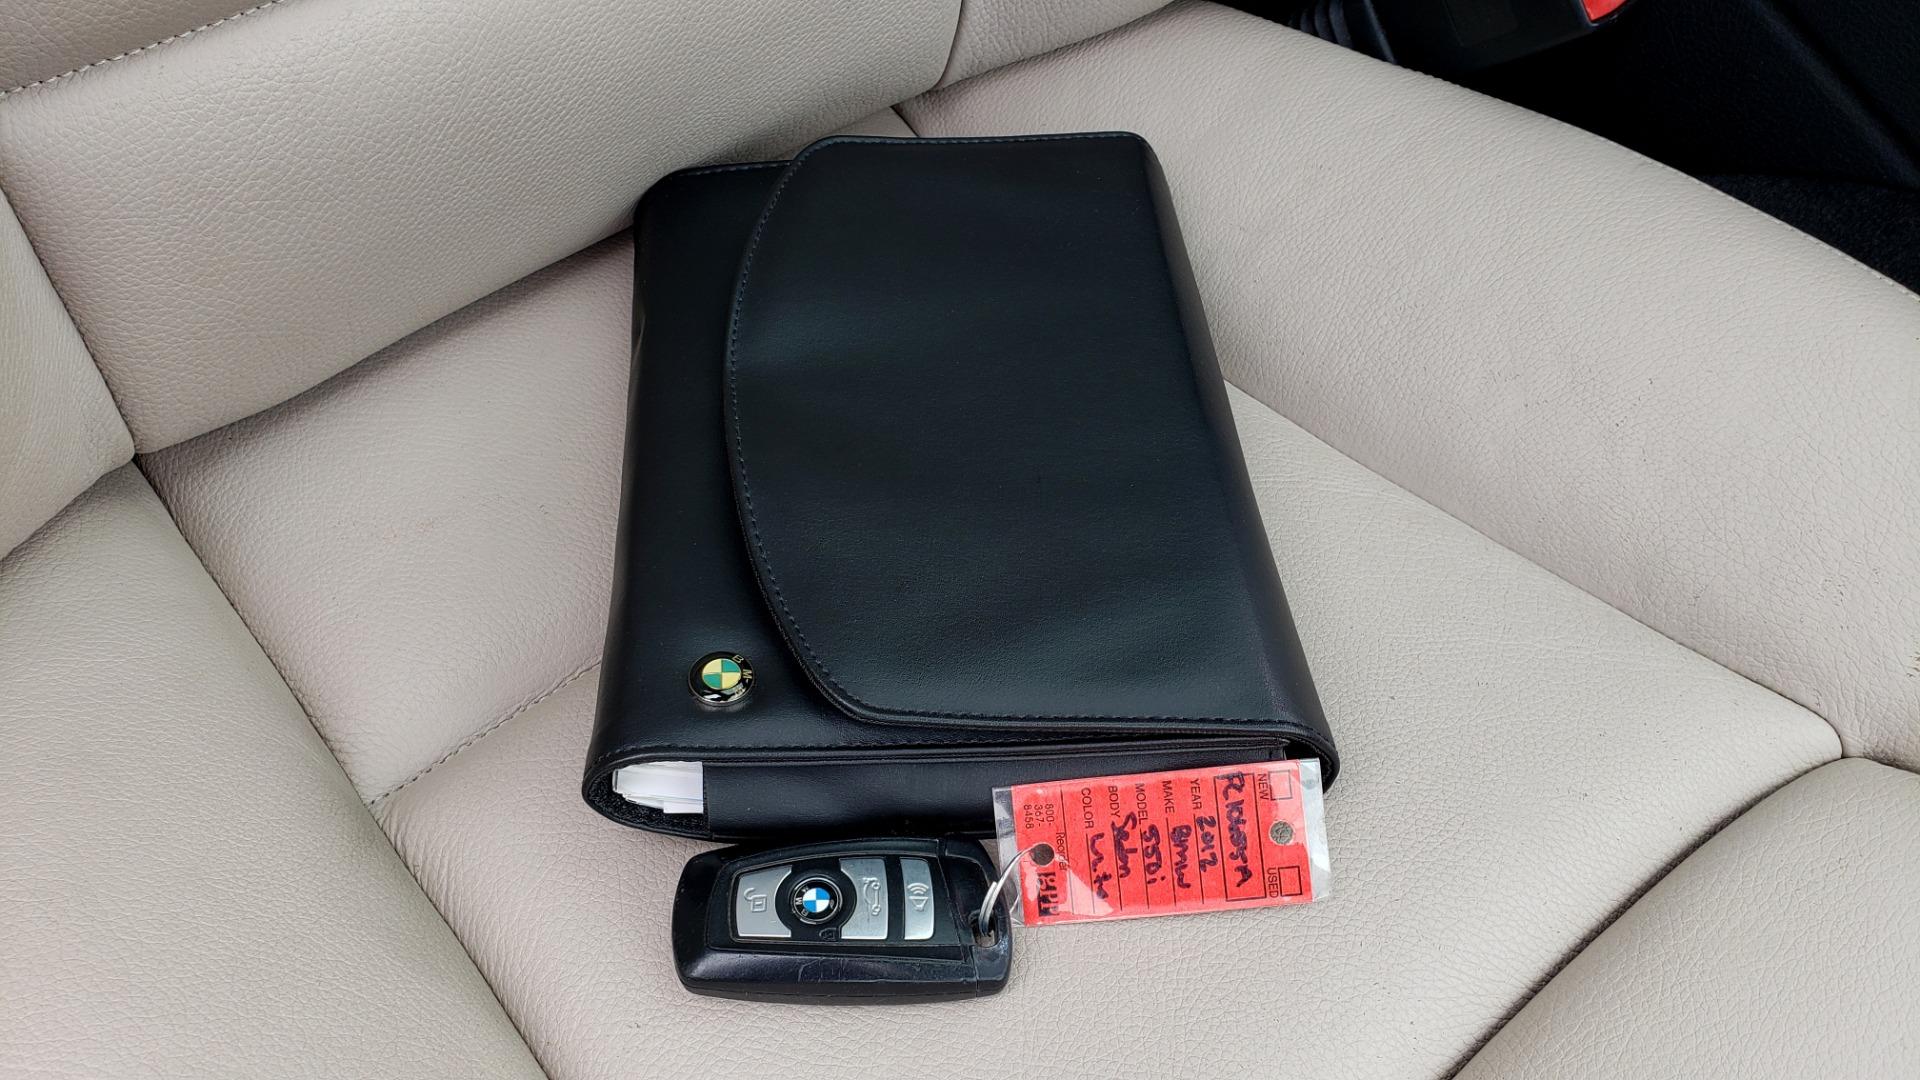 Used 2012 BMW 5 SERIES 550I M SPORT / NAV / CONV PKG / SUNROOF / PREM SND / REARVIEW for sale Sold at Formula Imports in Charlotte NC 28227 69